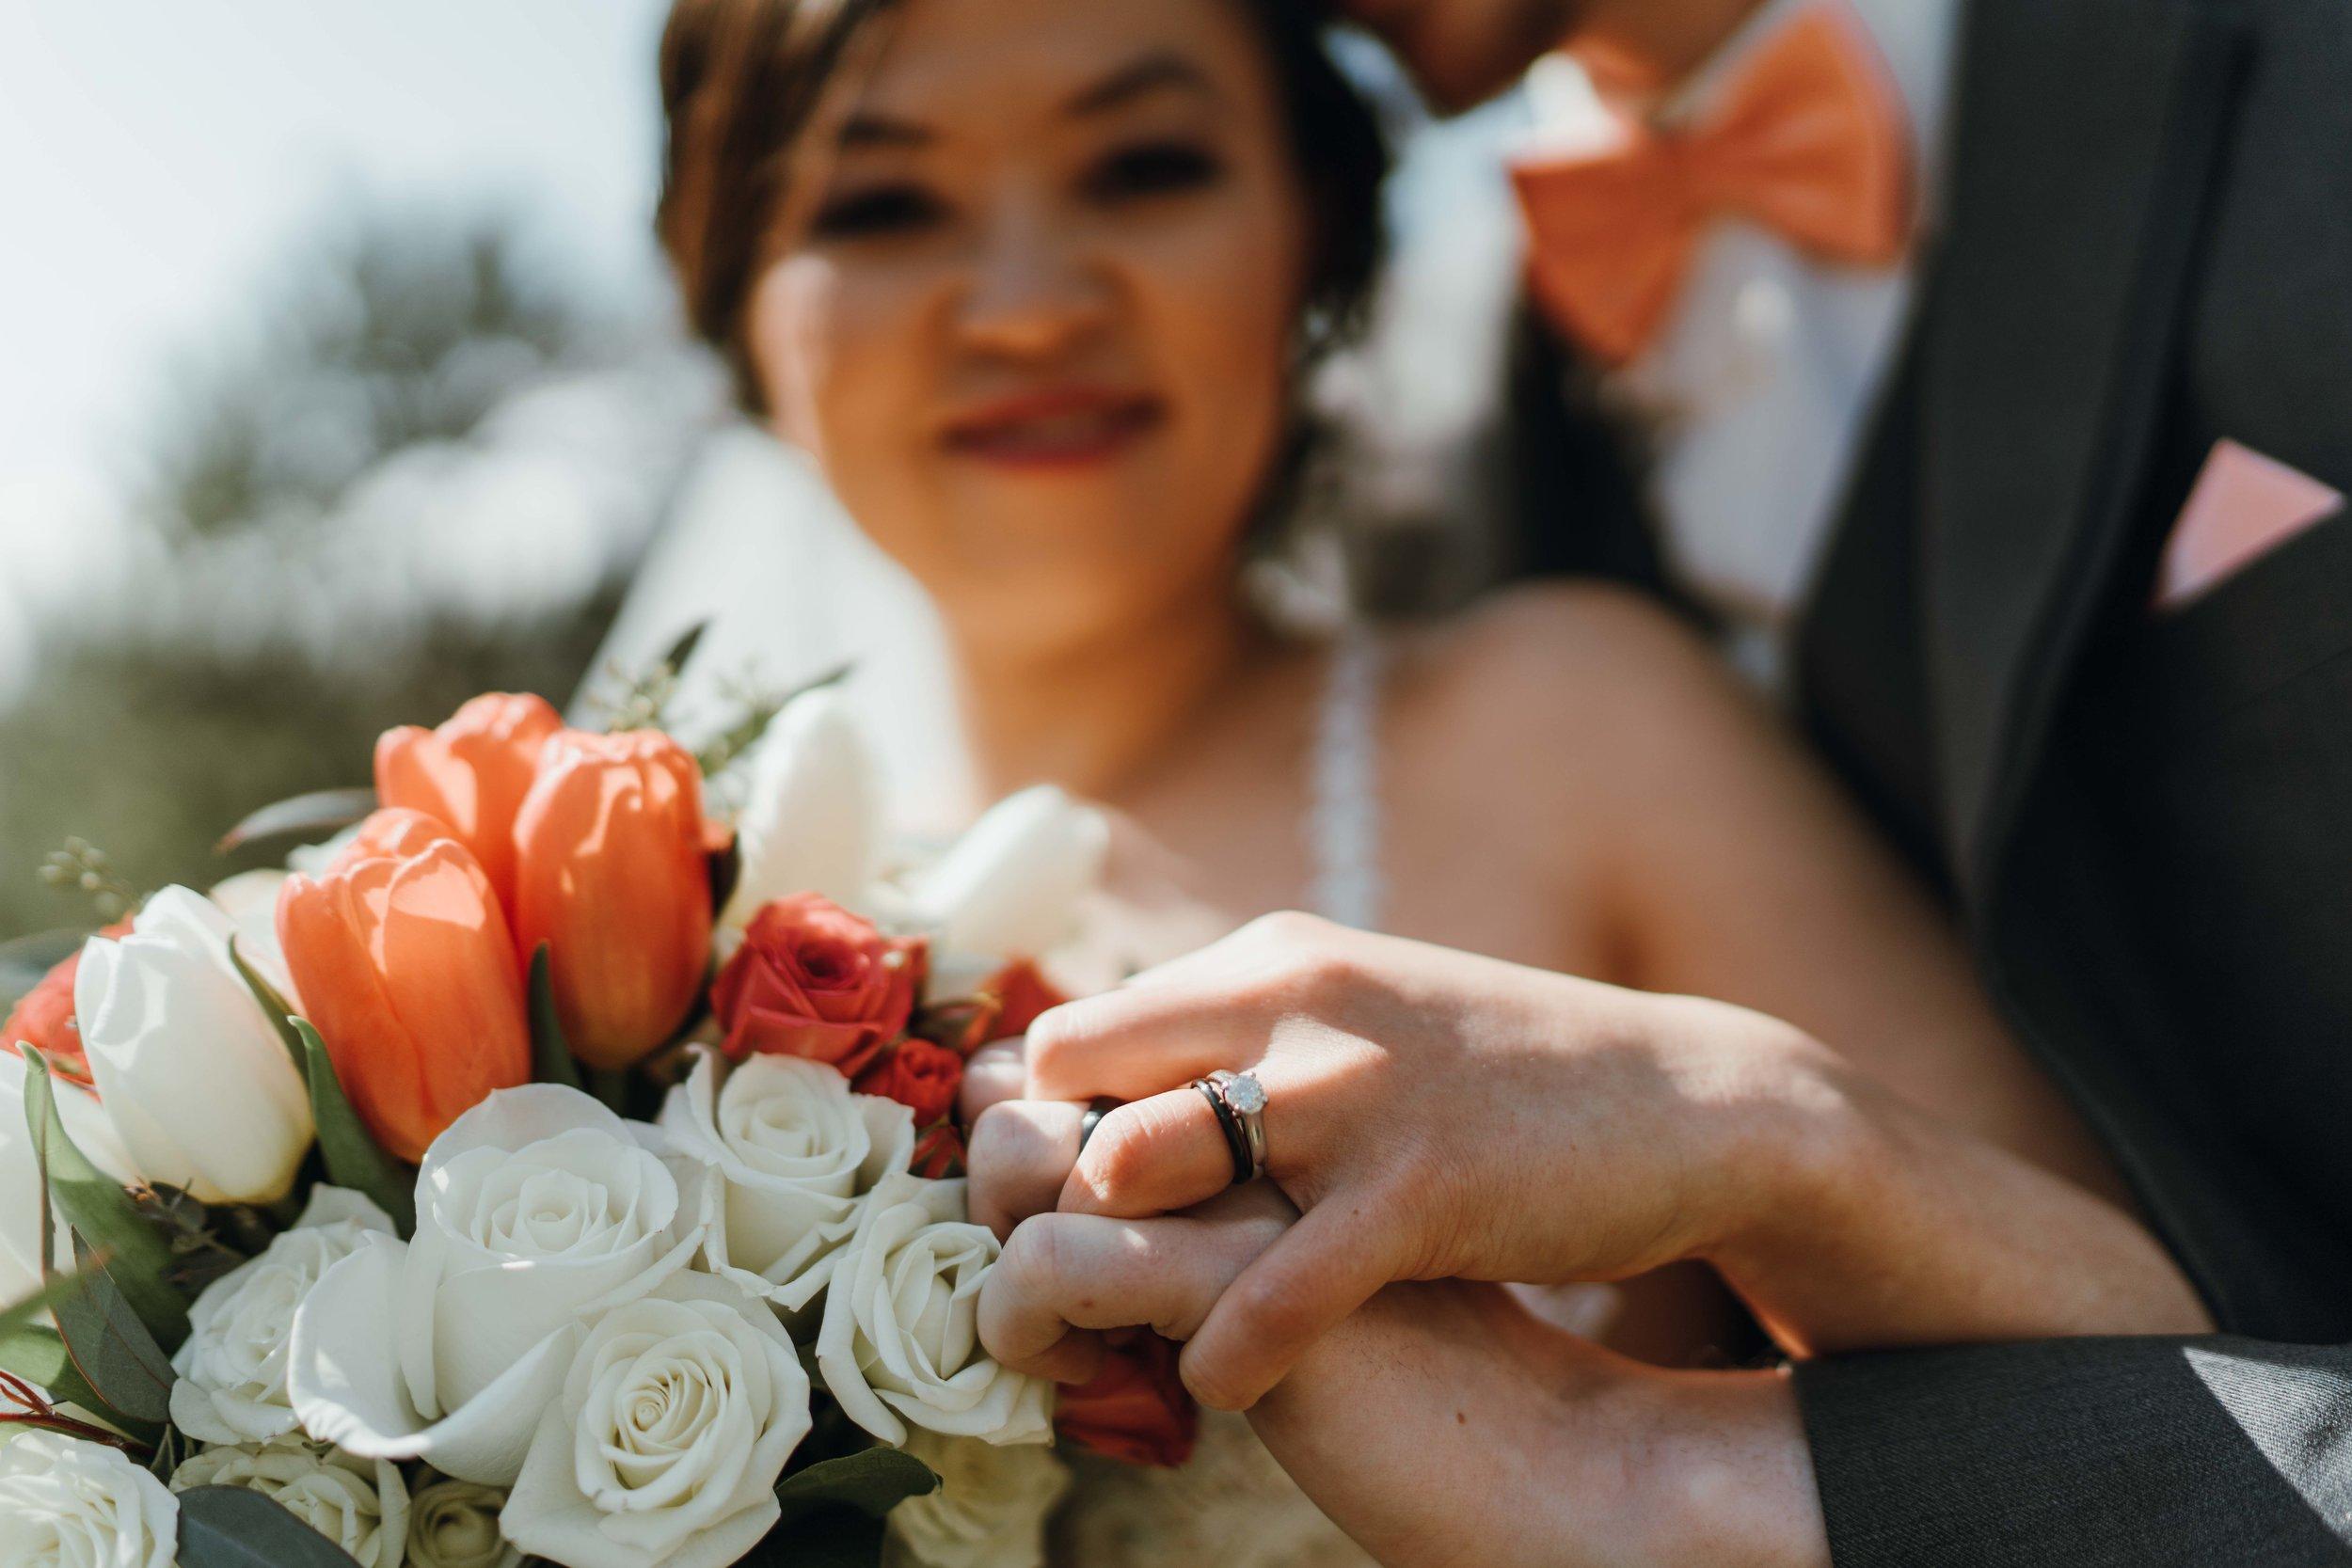 denver wedding photographer lioncrest manor in lyons ben and mali -DSC06010.jpg